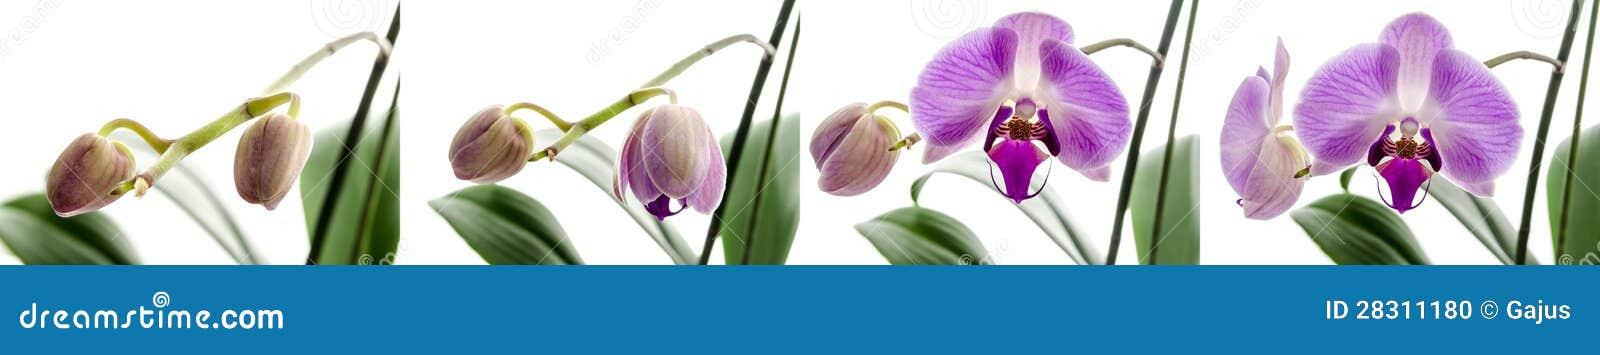 Orchid στάδια λουλουδιών της ανάπτυξης